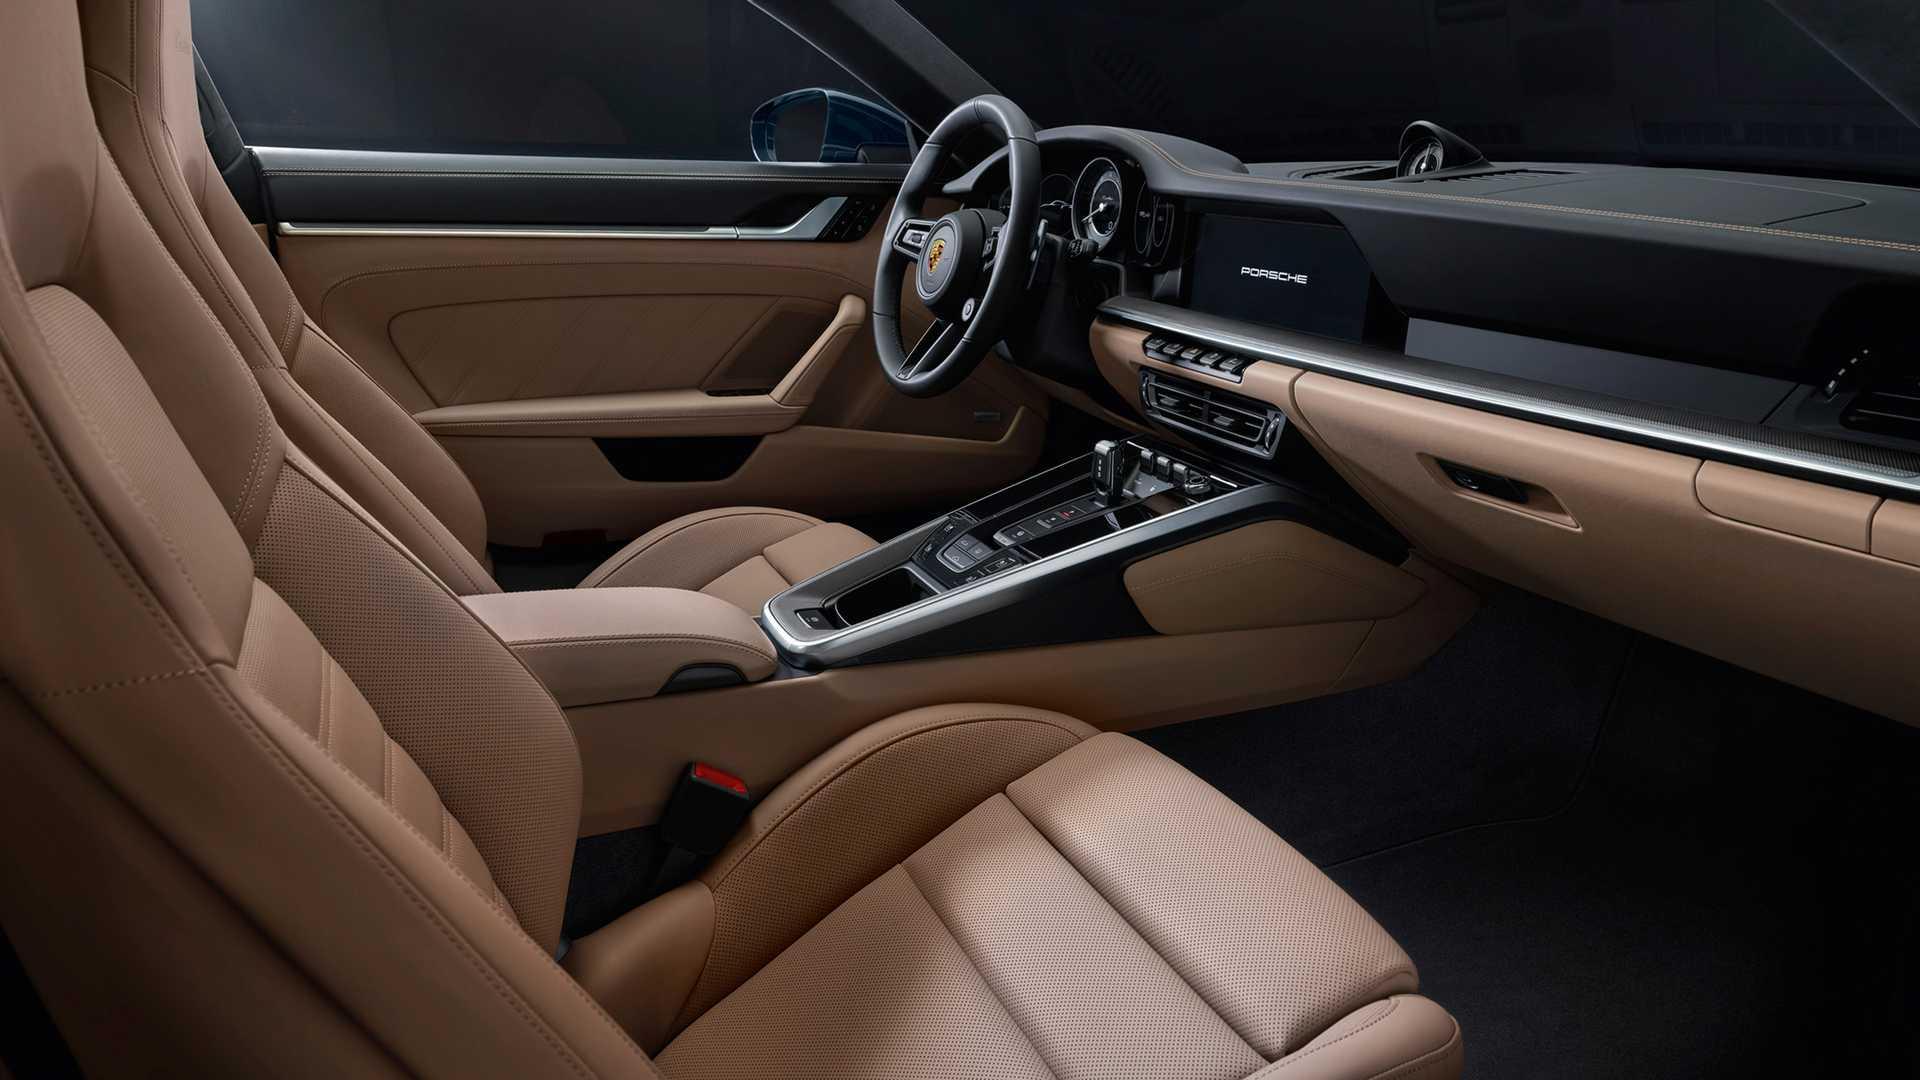 2021-porsche-911-turbo-coupe (5)